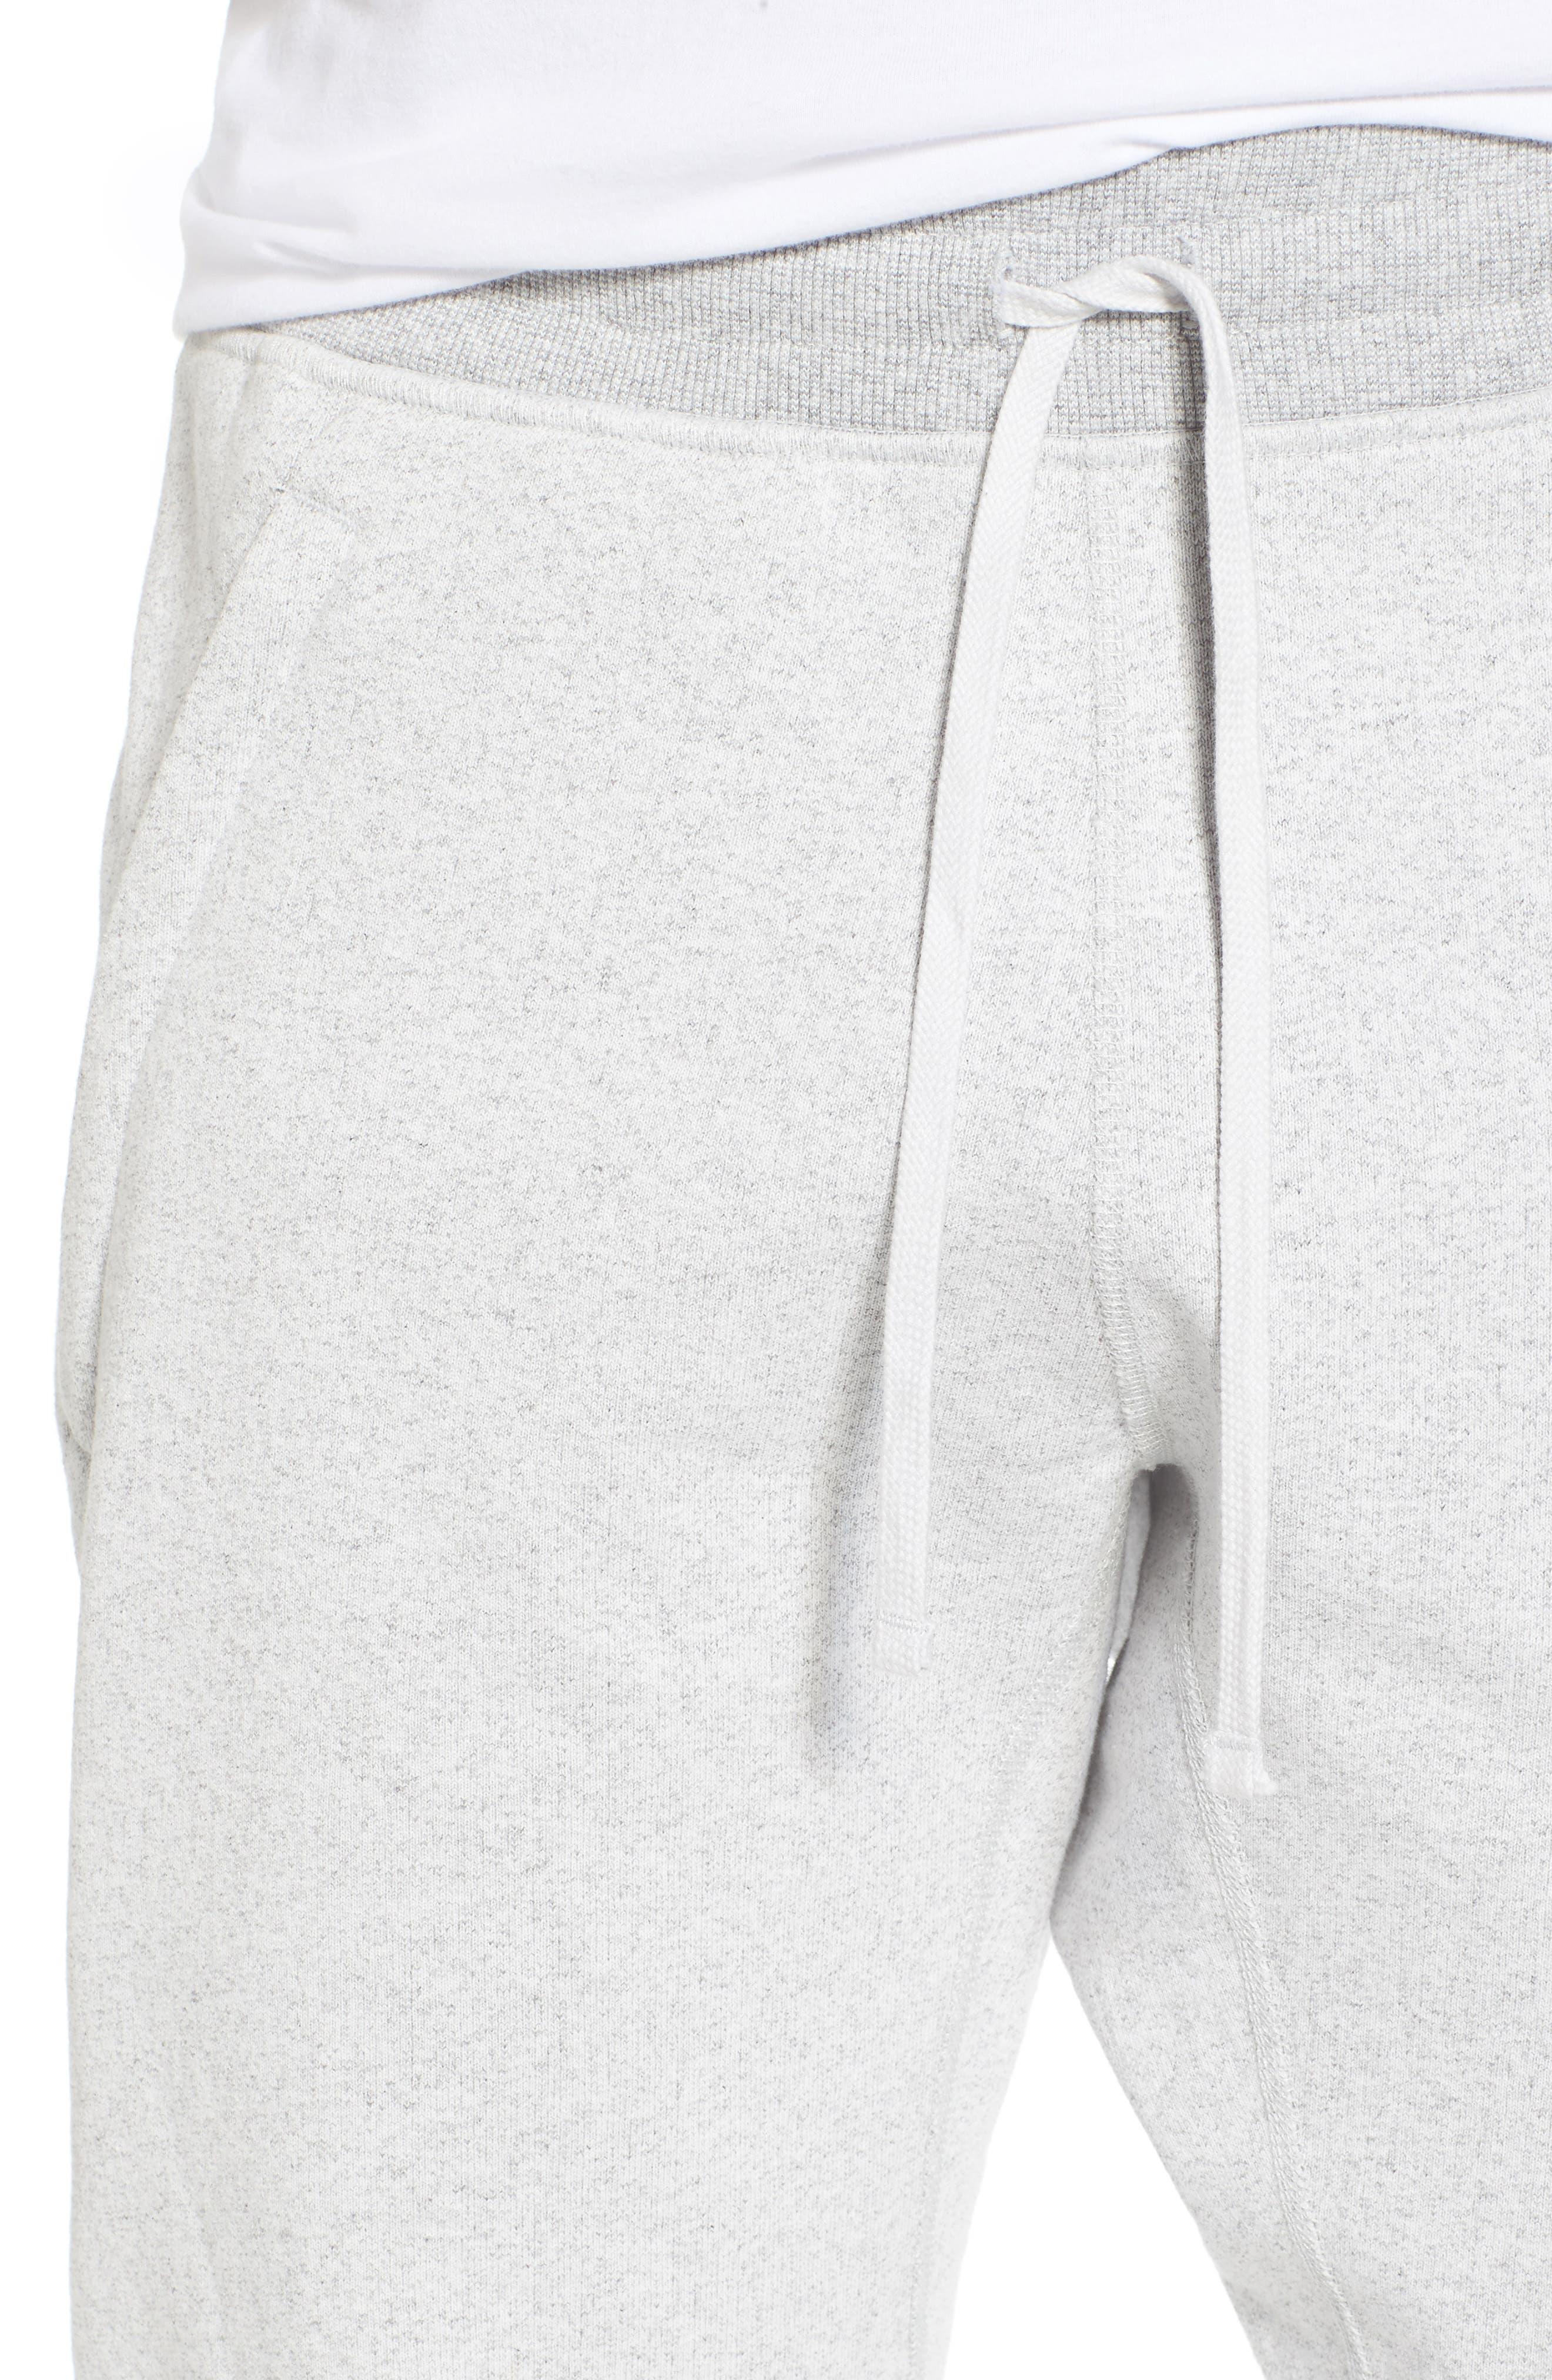 Slim Fit Heavyweight Sweatpants,                             Alternate thumbnail 4, color,                             Chalk